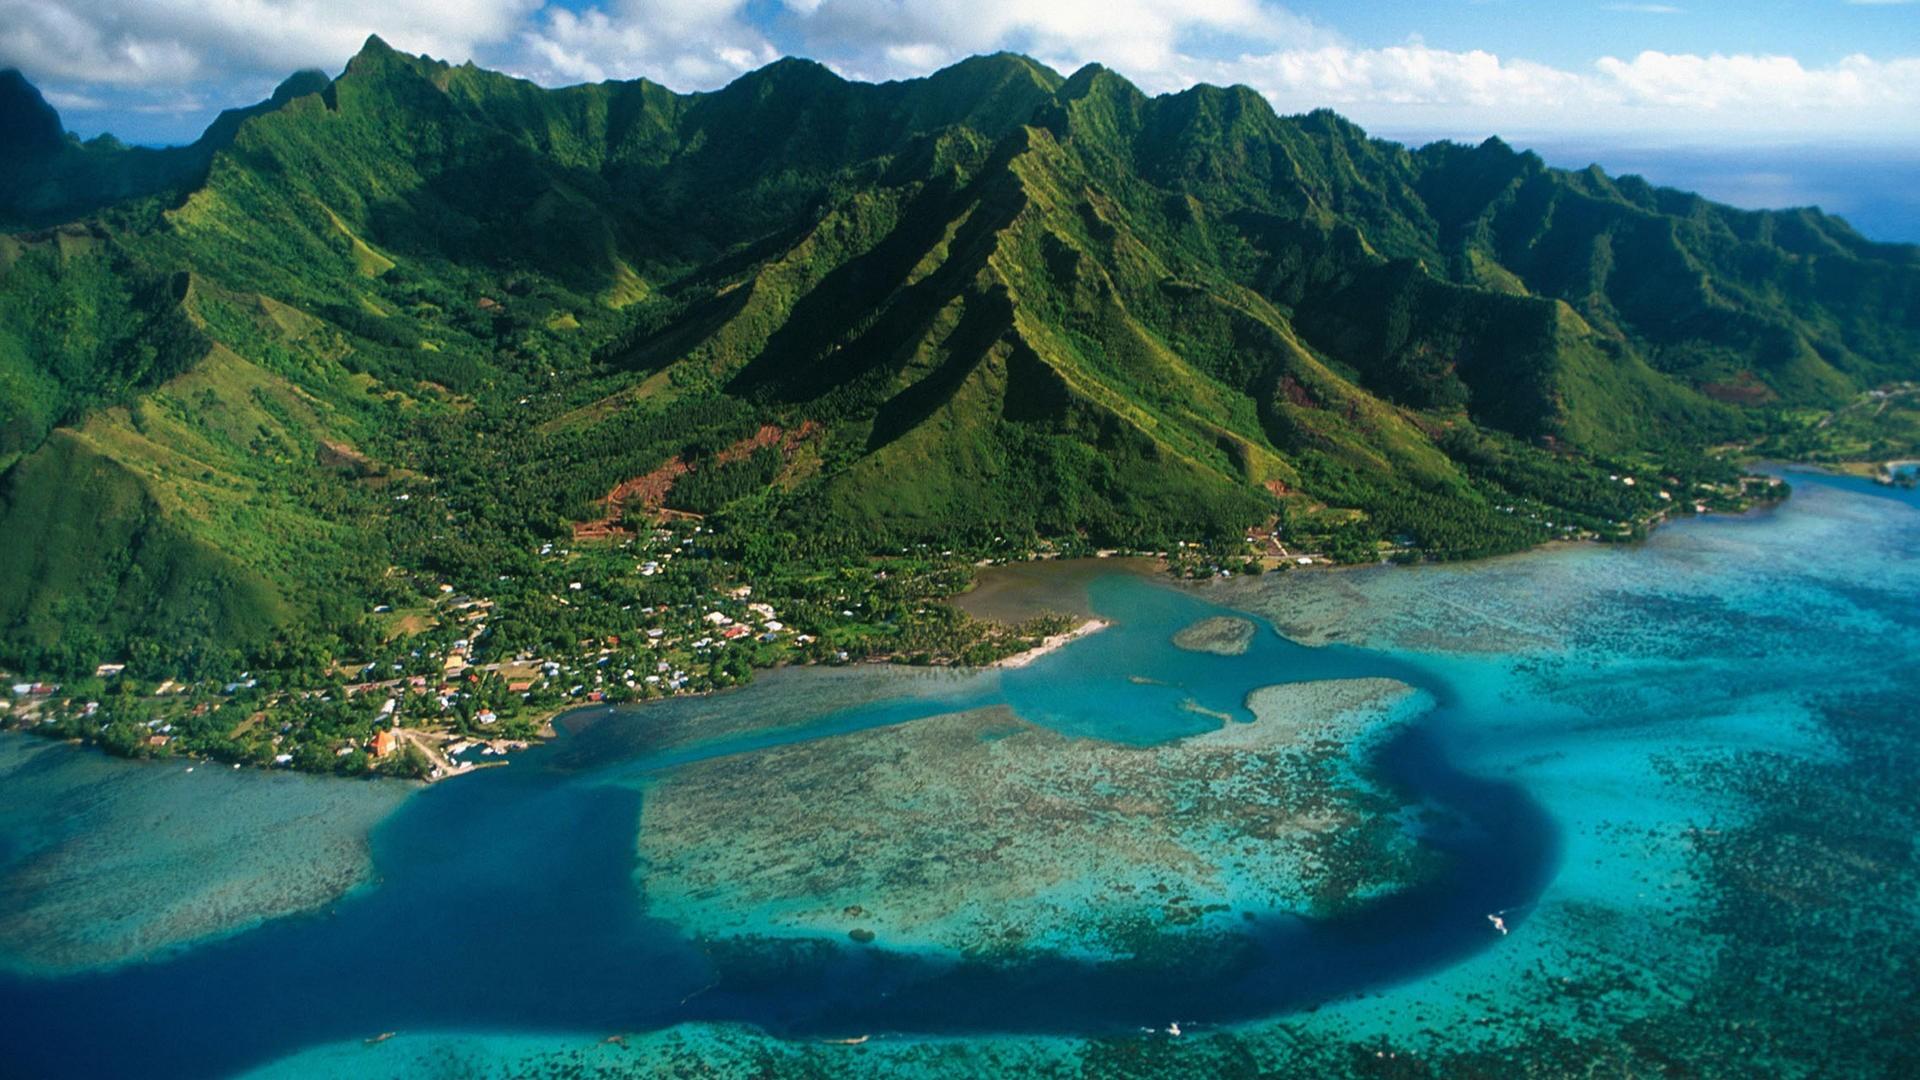 El juego de las palabras encadenadas-http://lynxdxg.com/wp-content/uploads/2016/09/a3-Tonga-Green-Mountains-HD-Wallpapers.jpg